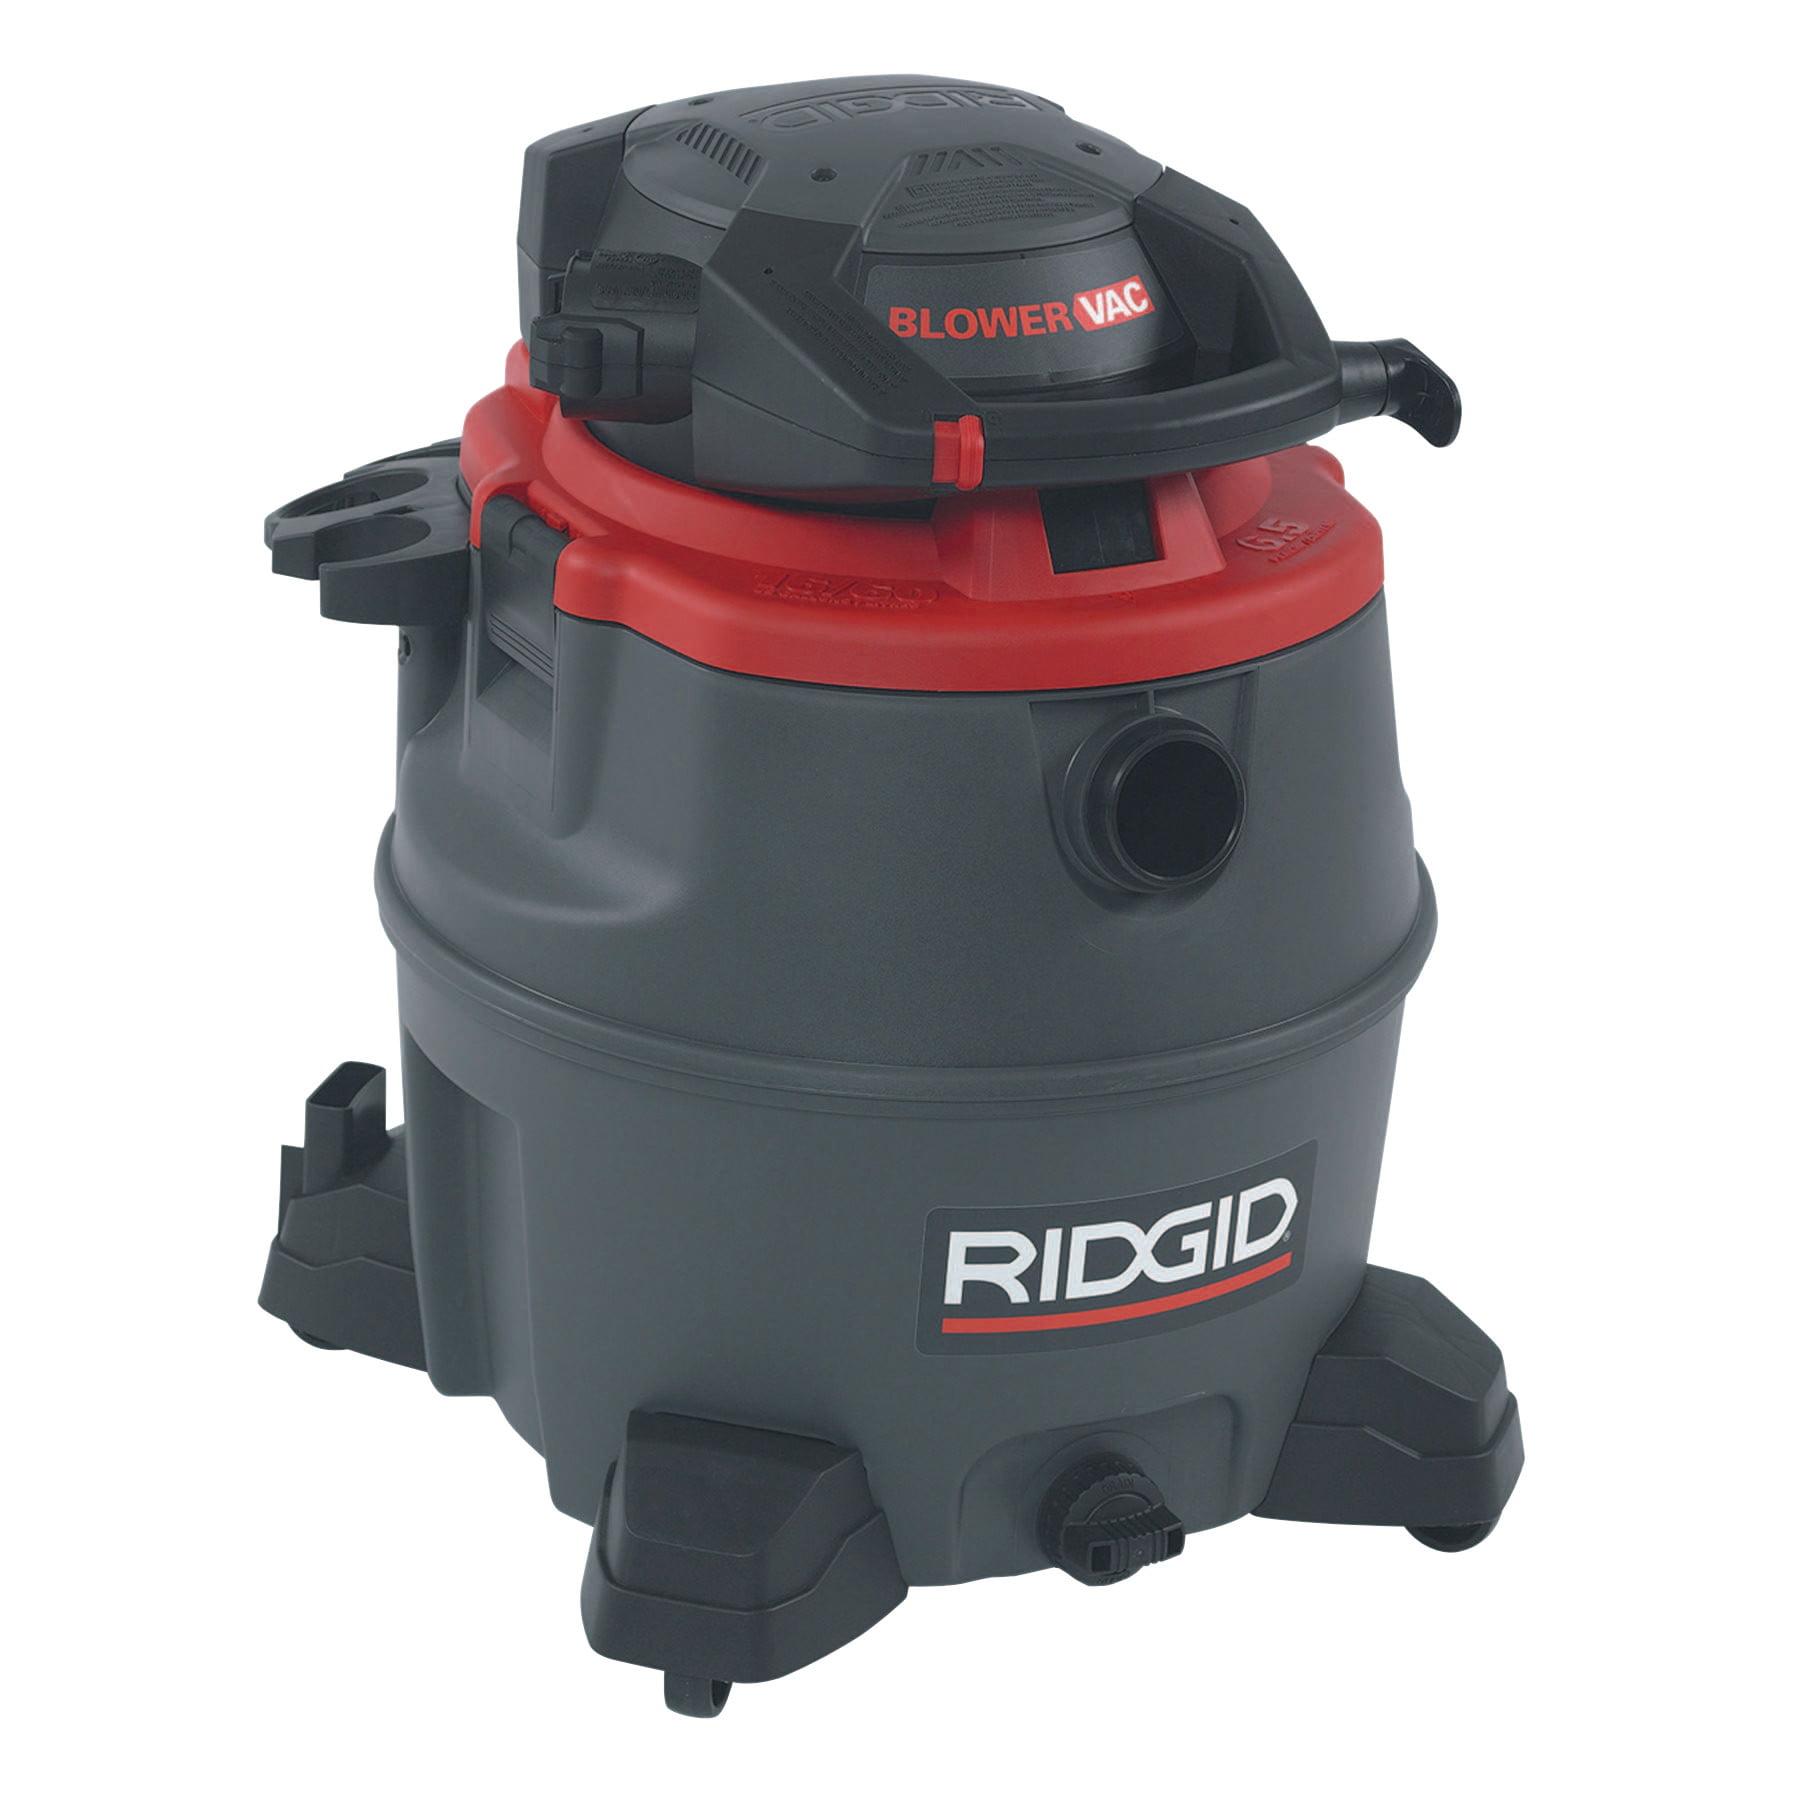 Ridgid Red Wet/Dry Vac Model 1620RV with Detachable Blower, 16 gal, 6.5 hp